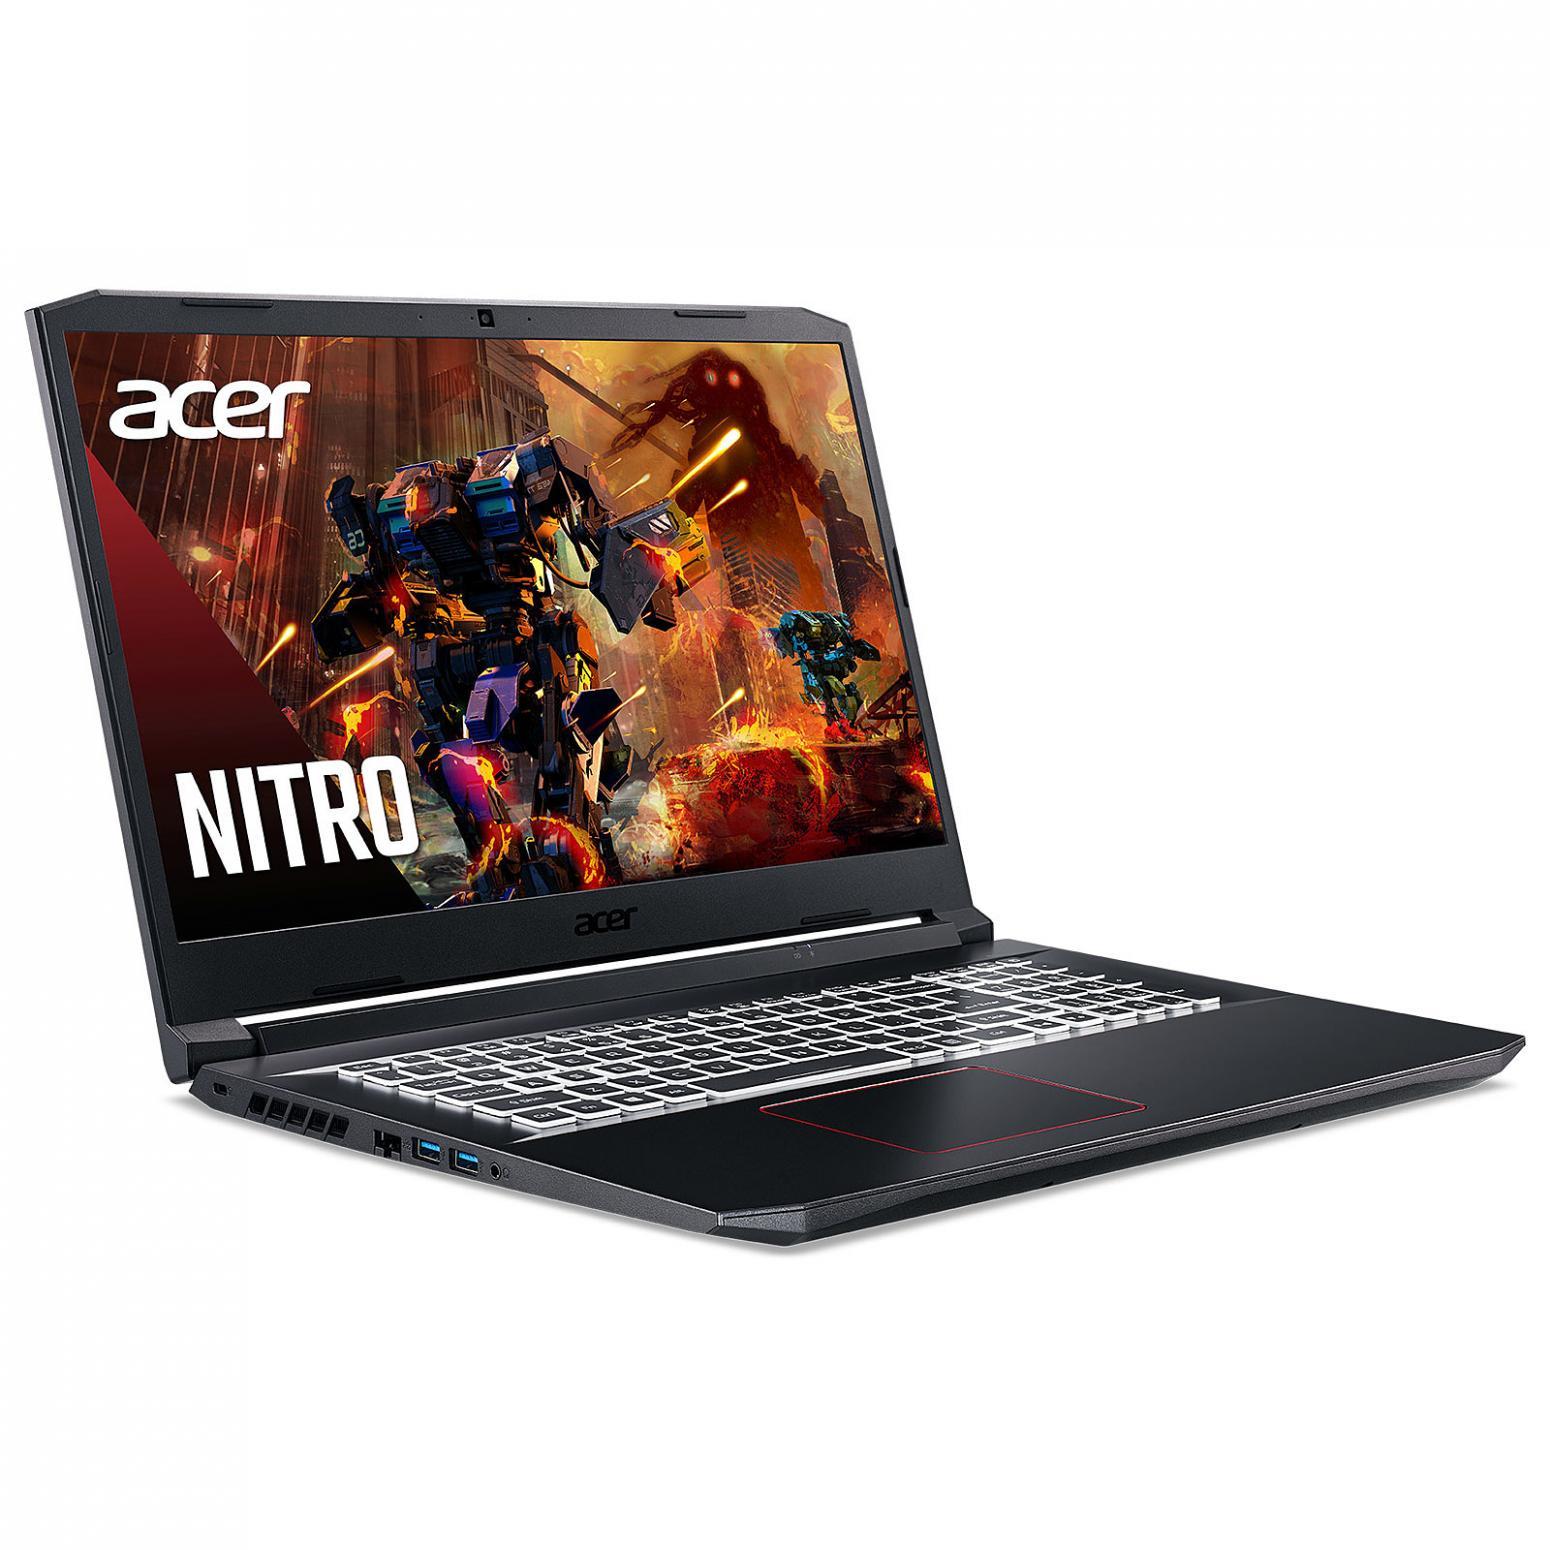 Ordinateur portable Acer Nitro 5 AN517-41-R3J6 - RTX 3080, 144Hz - photo 4